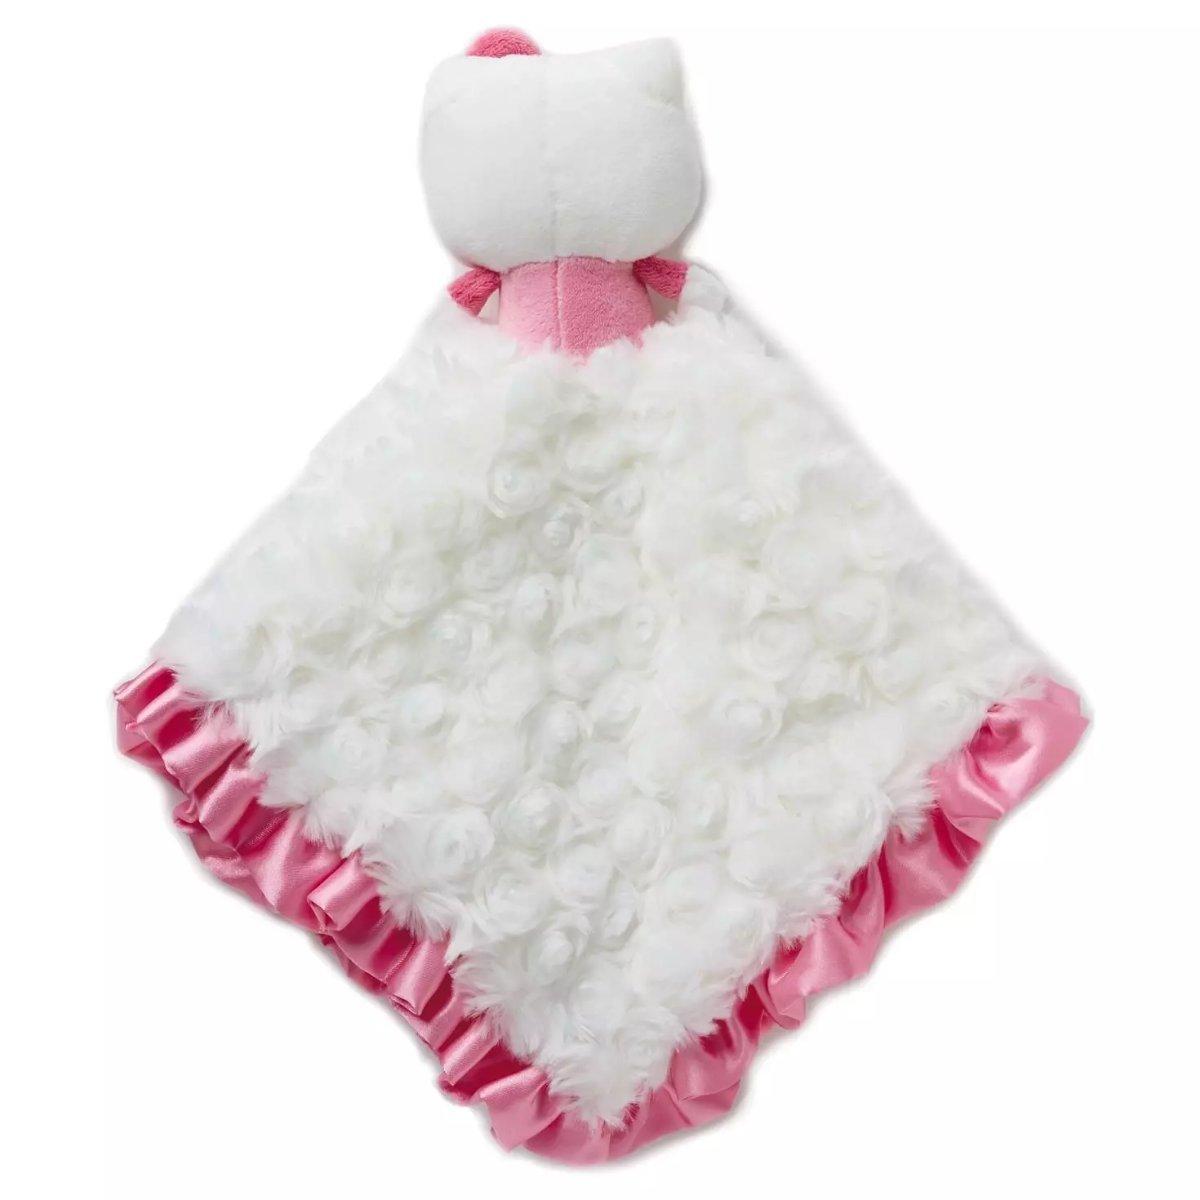 30a587da9 Amazon.com : Hallmark Hello Kitty Itty Bitty Baby Lovey Blanket : Baby